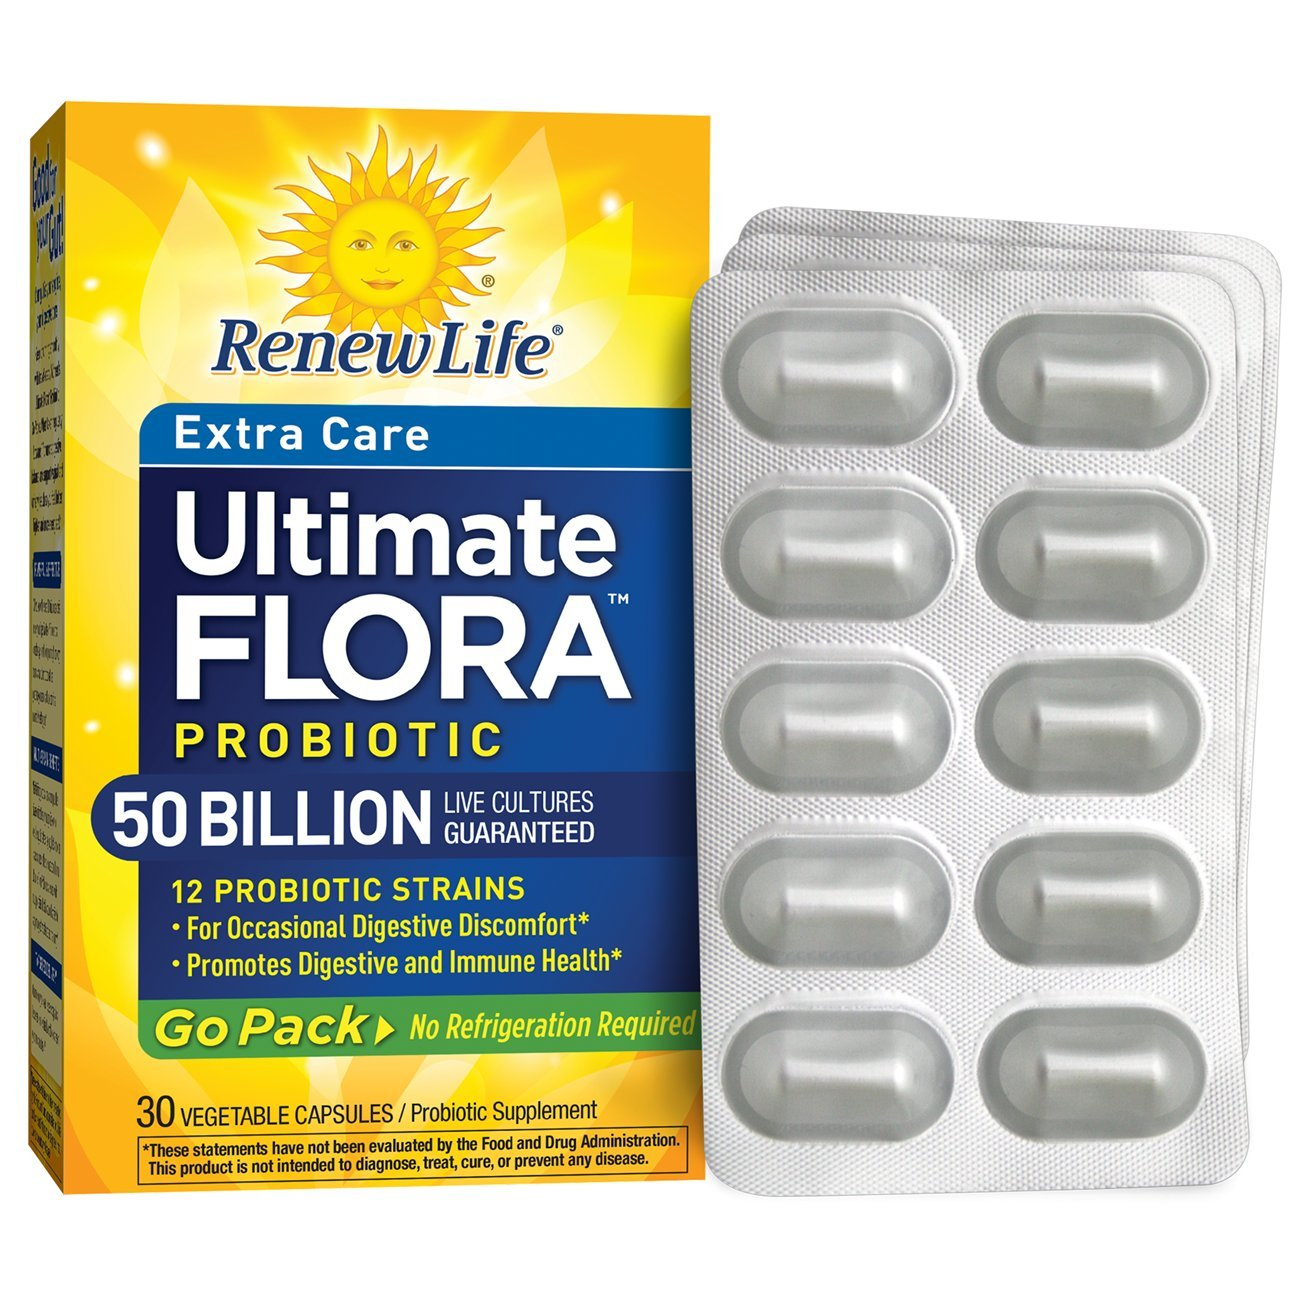 Renew Life - Ultimate Flora Probiotic Extra Care - 50 billion - 30 vegetable capsules - Go Pack